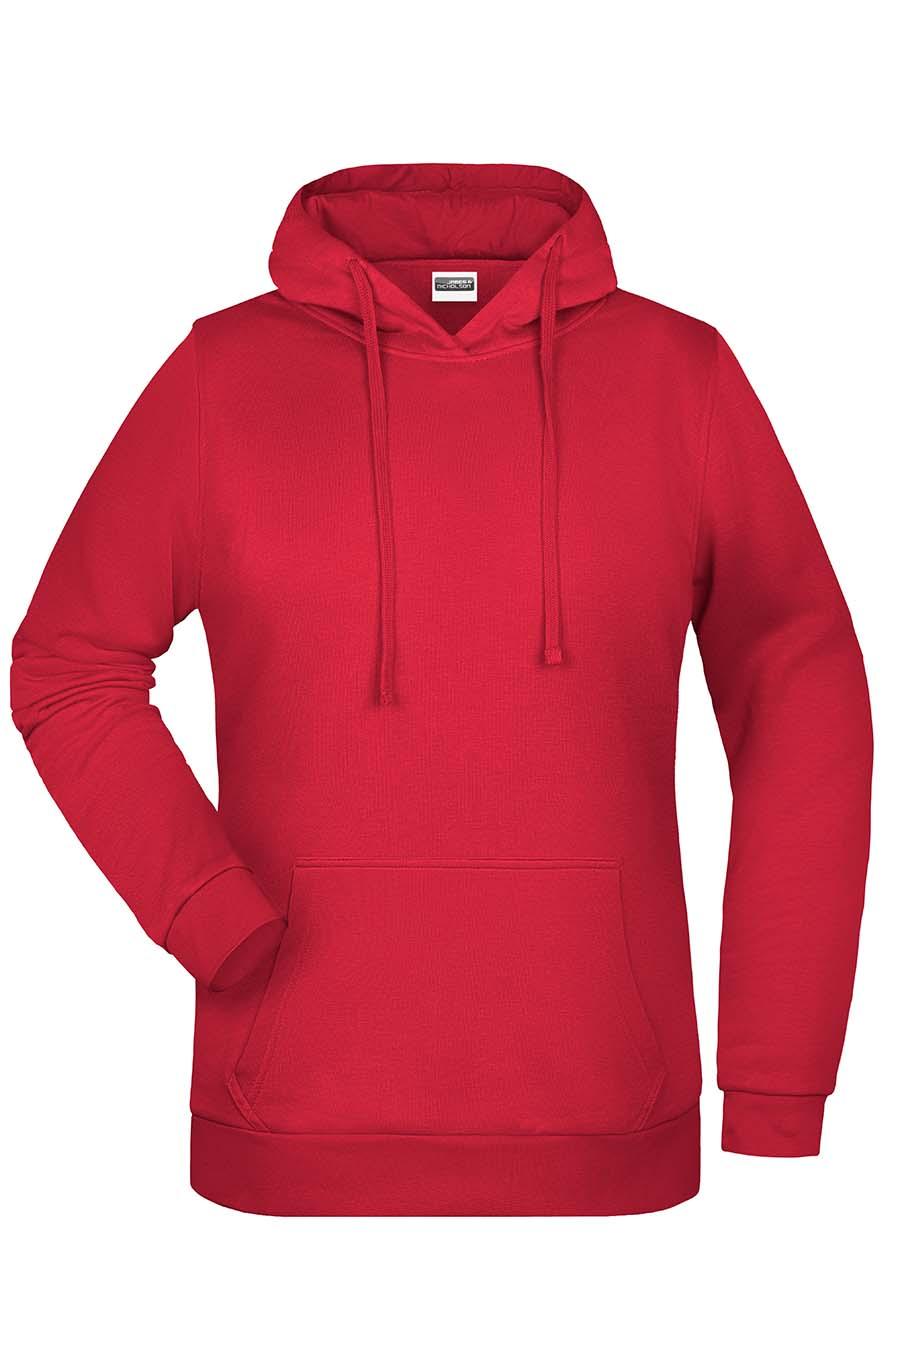 Sweat-shirt capuche femme - 20-1494-17